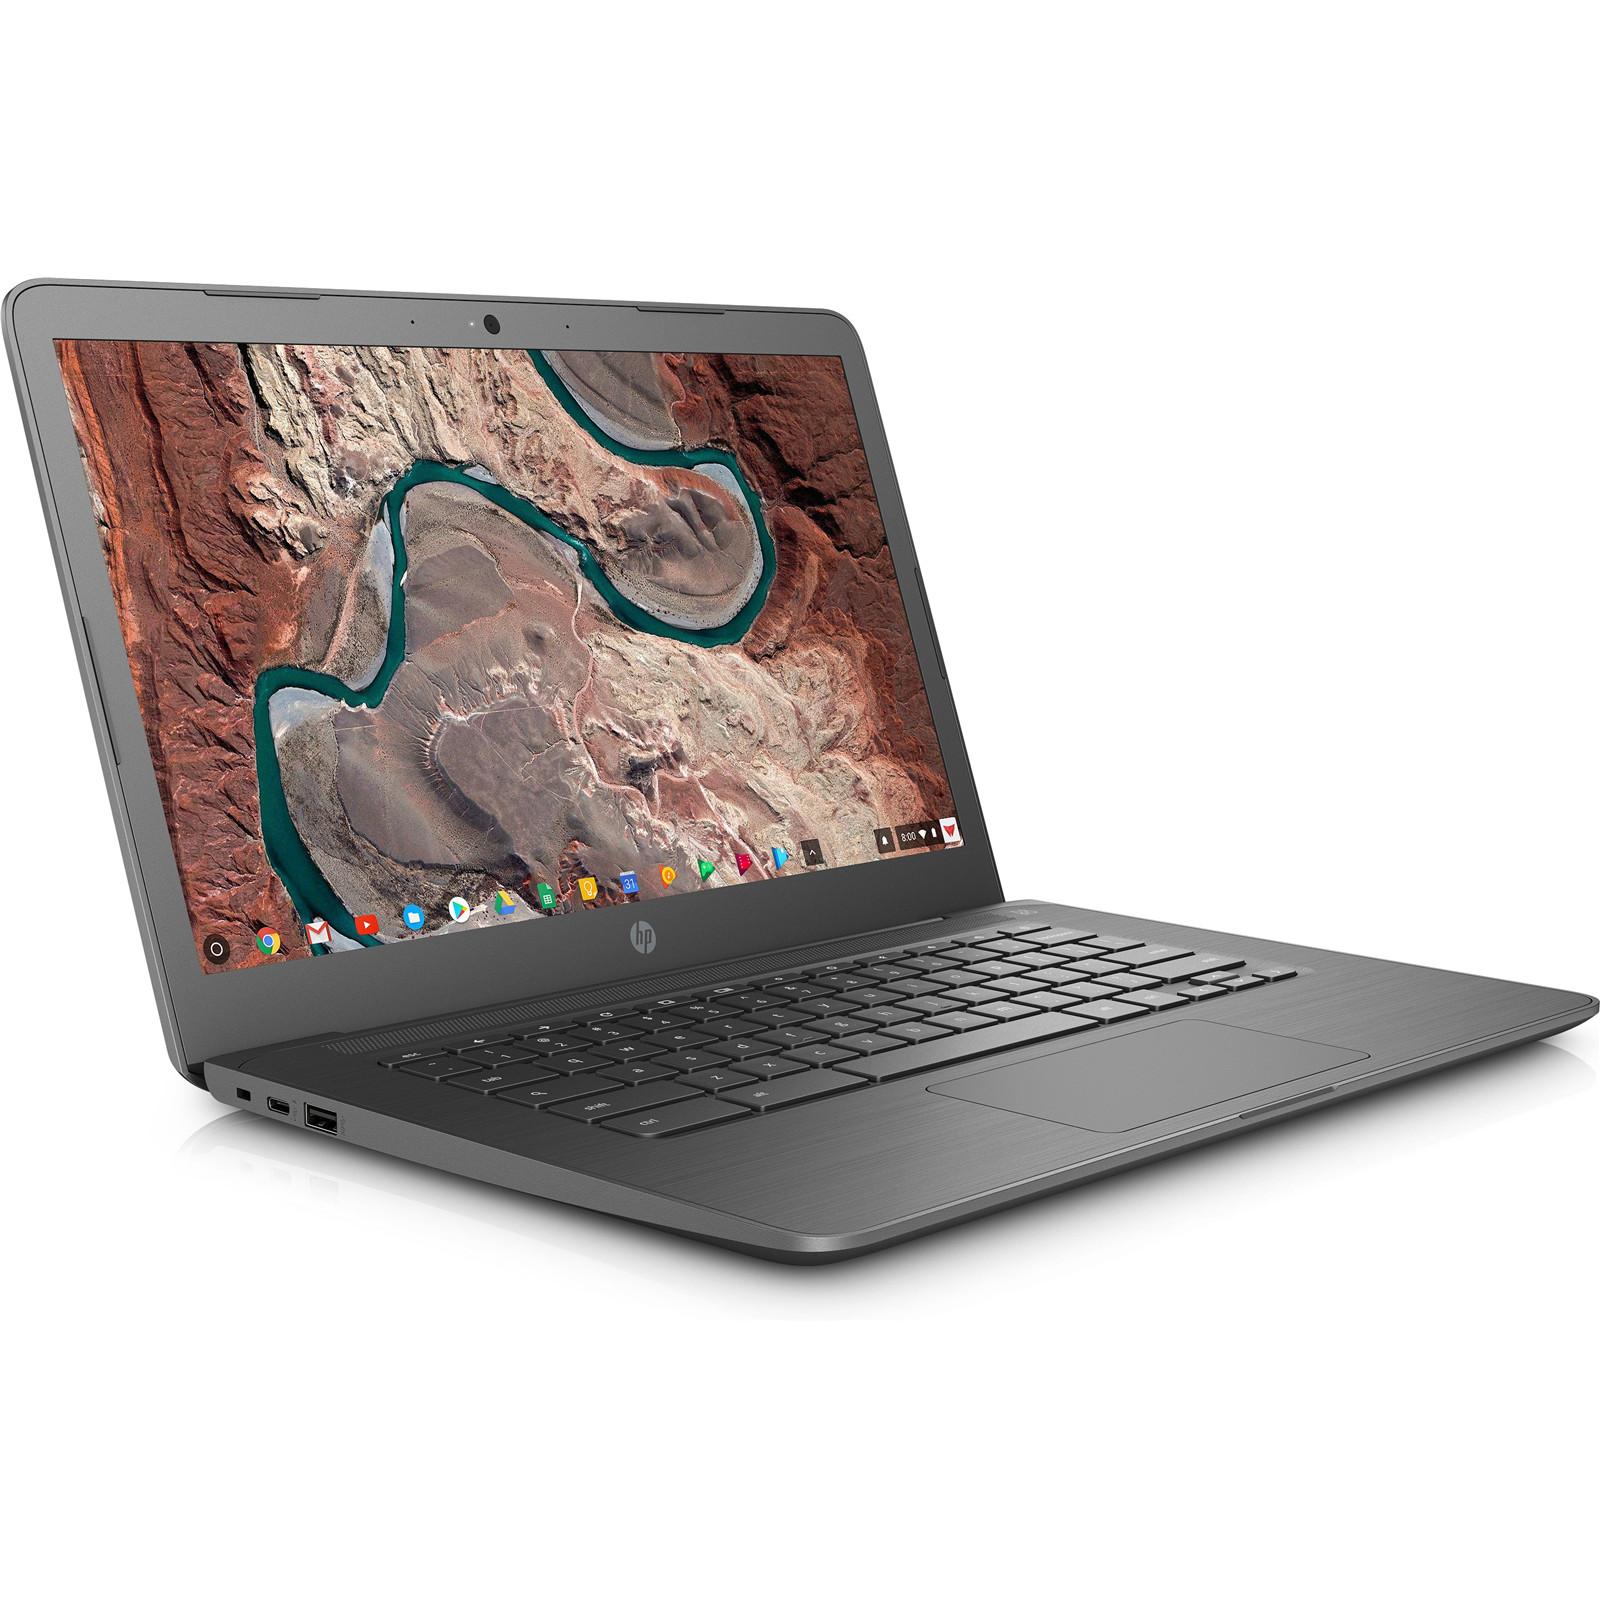 1eb78916edb9 Buy the HP Chromebook 14 G5 Education Notebook, 14